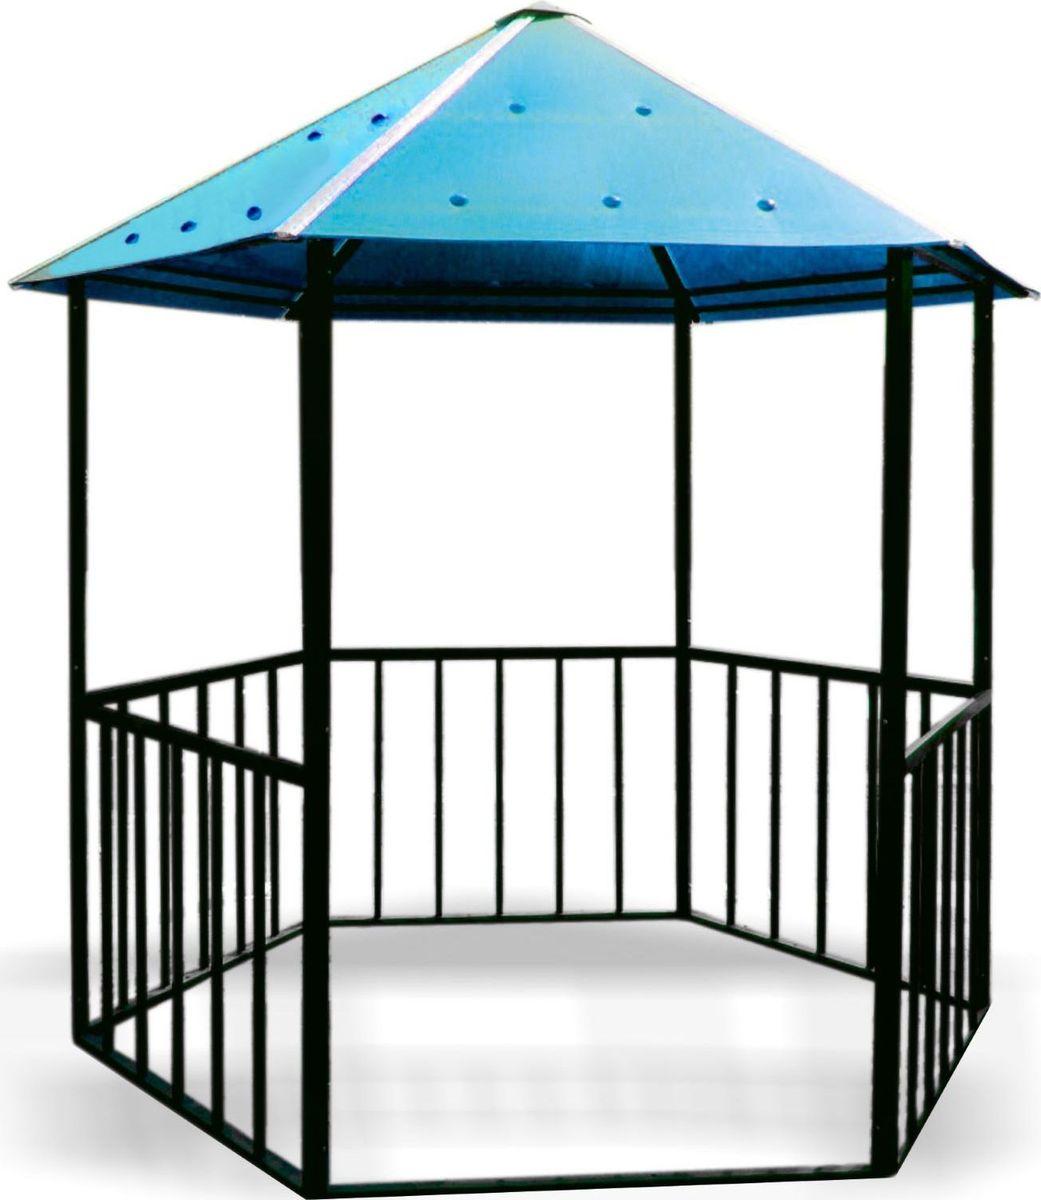 "Беседка садовая ""Семейная"", разборная, с крышей, цвет: синий, 2,5 х 2,5 м, NoName"